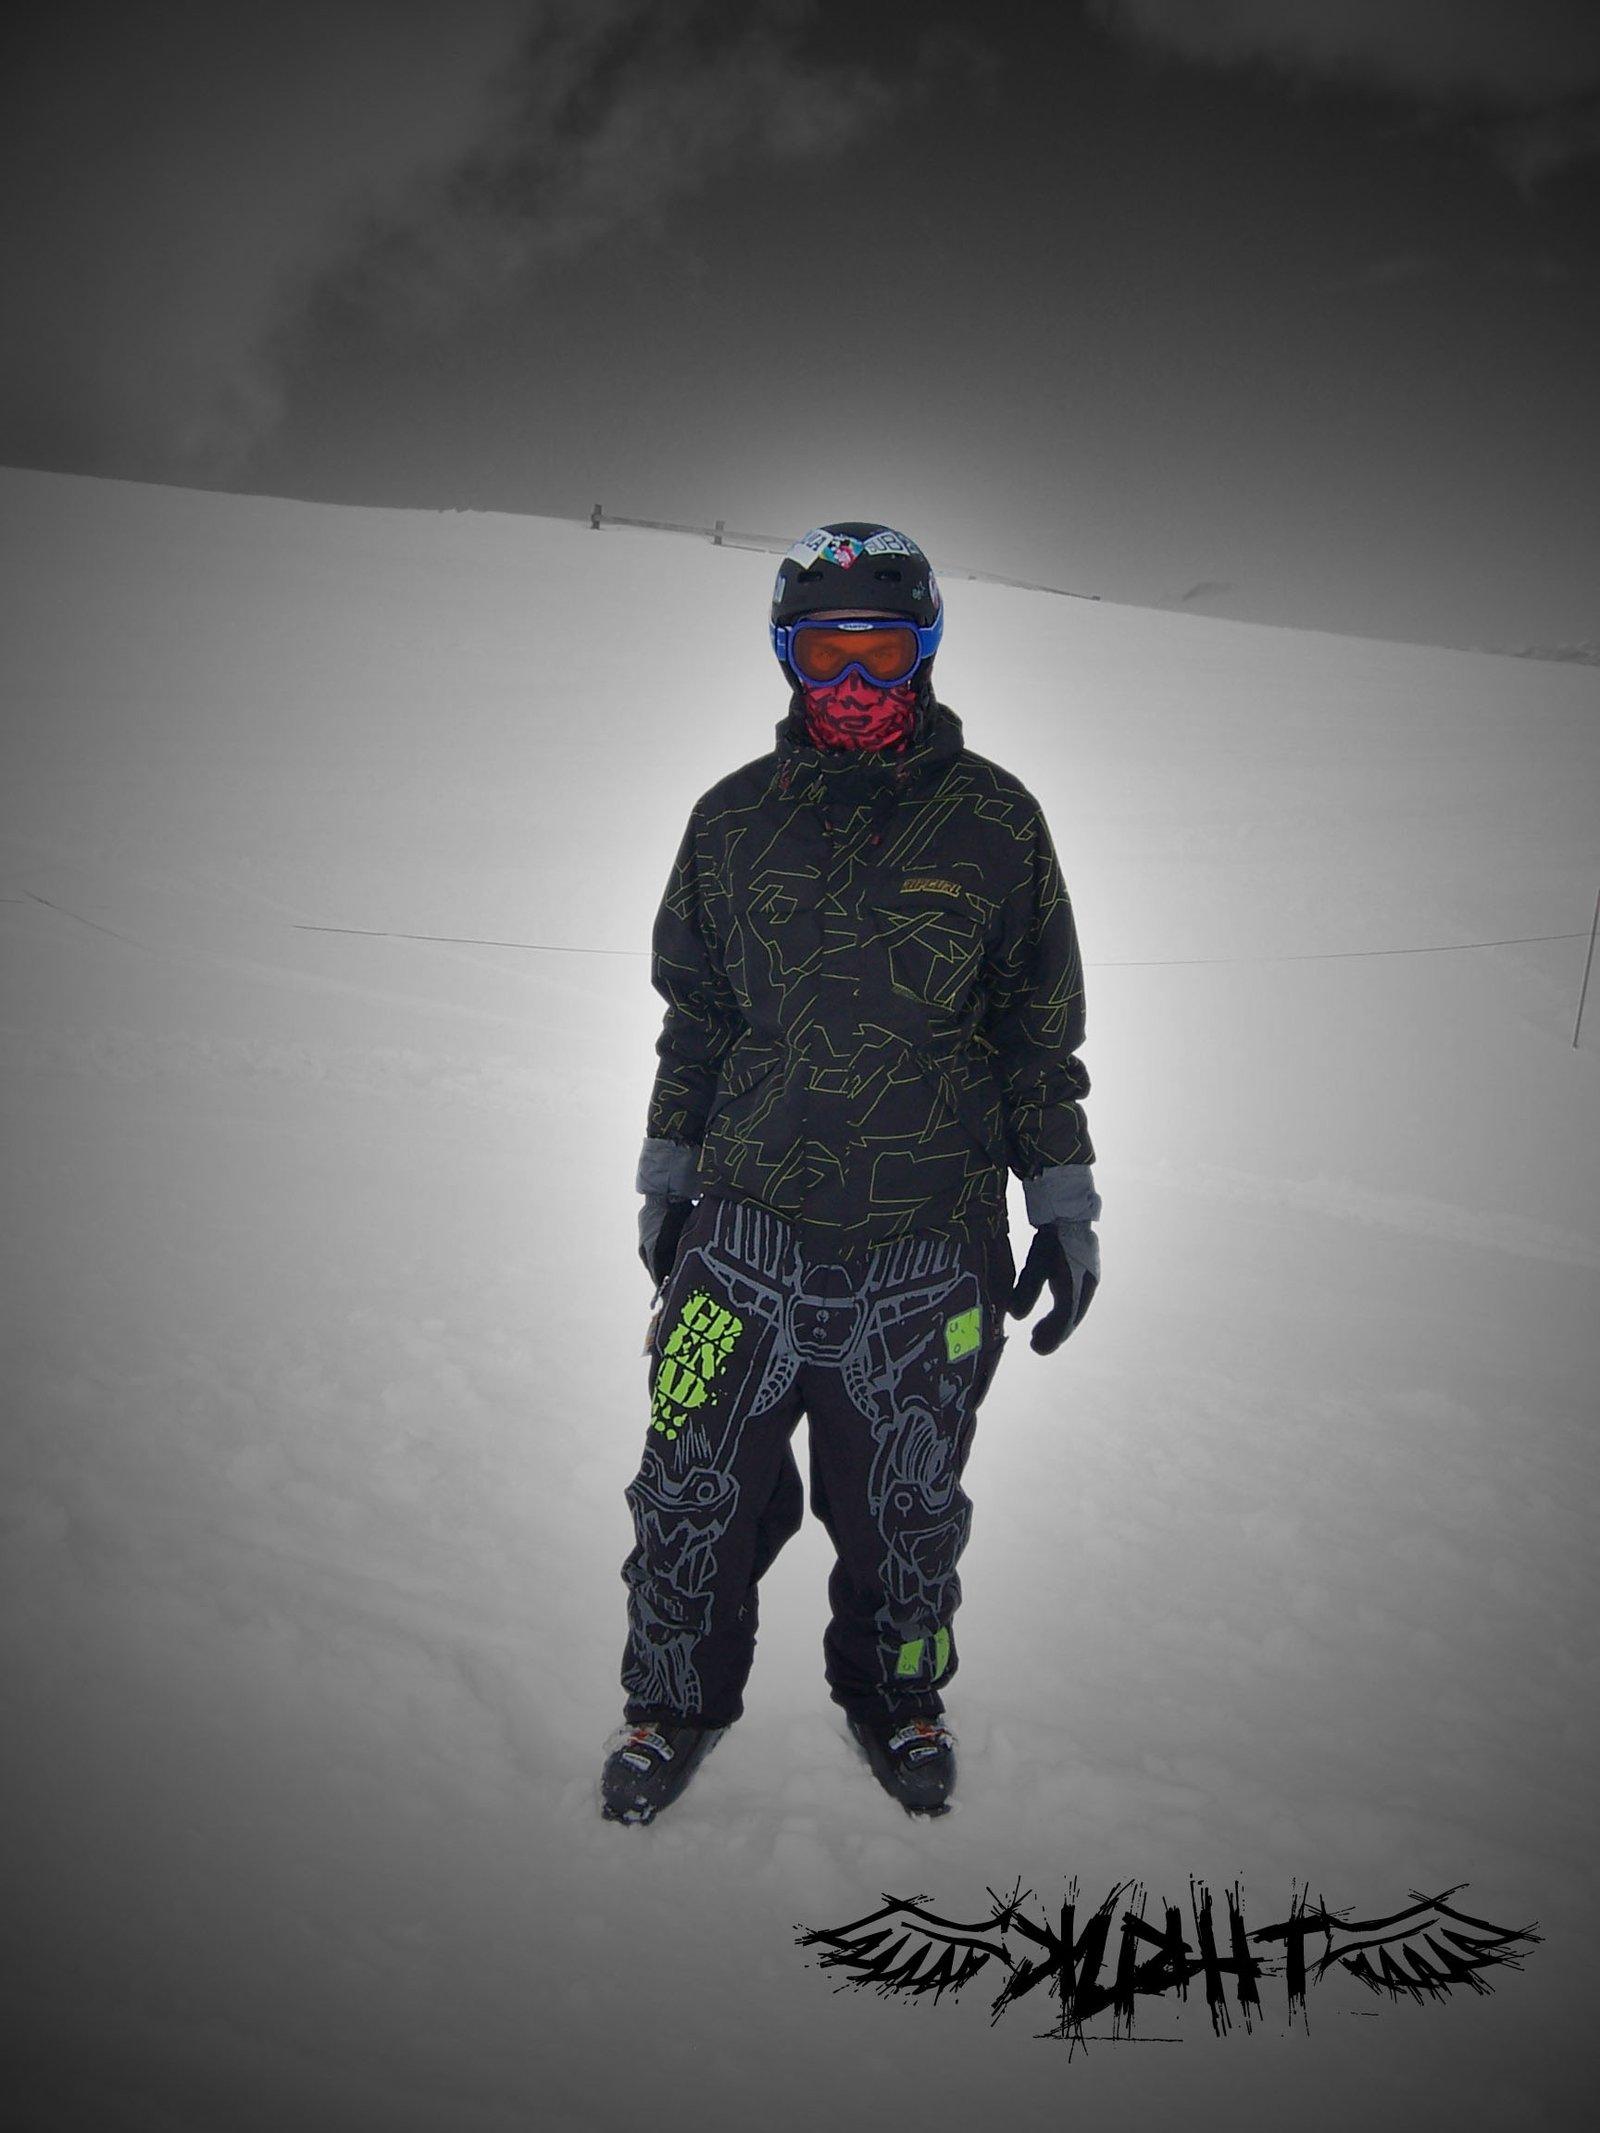 My old ski gear